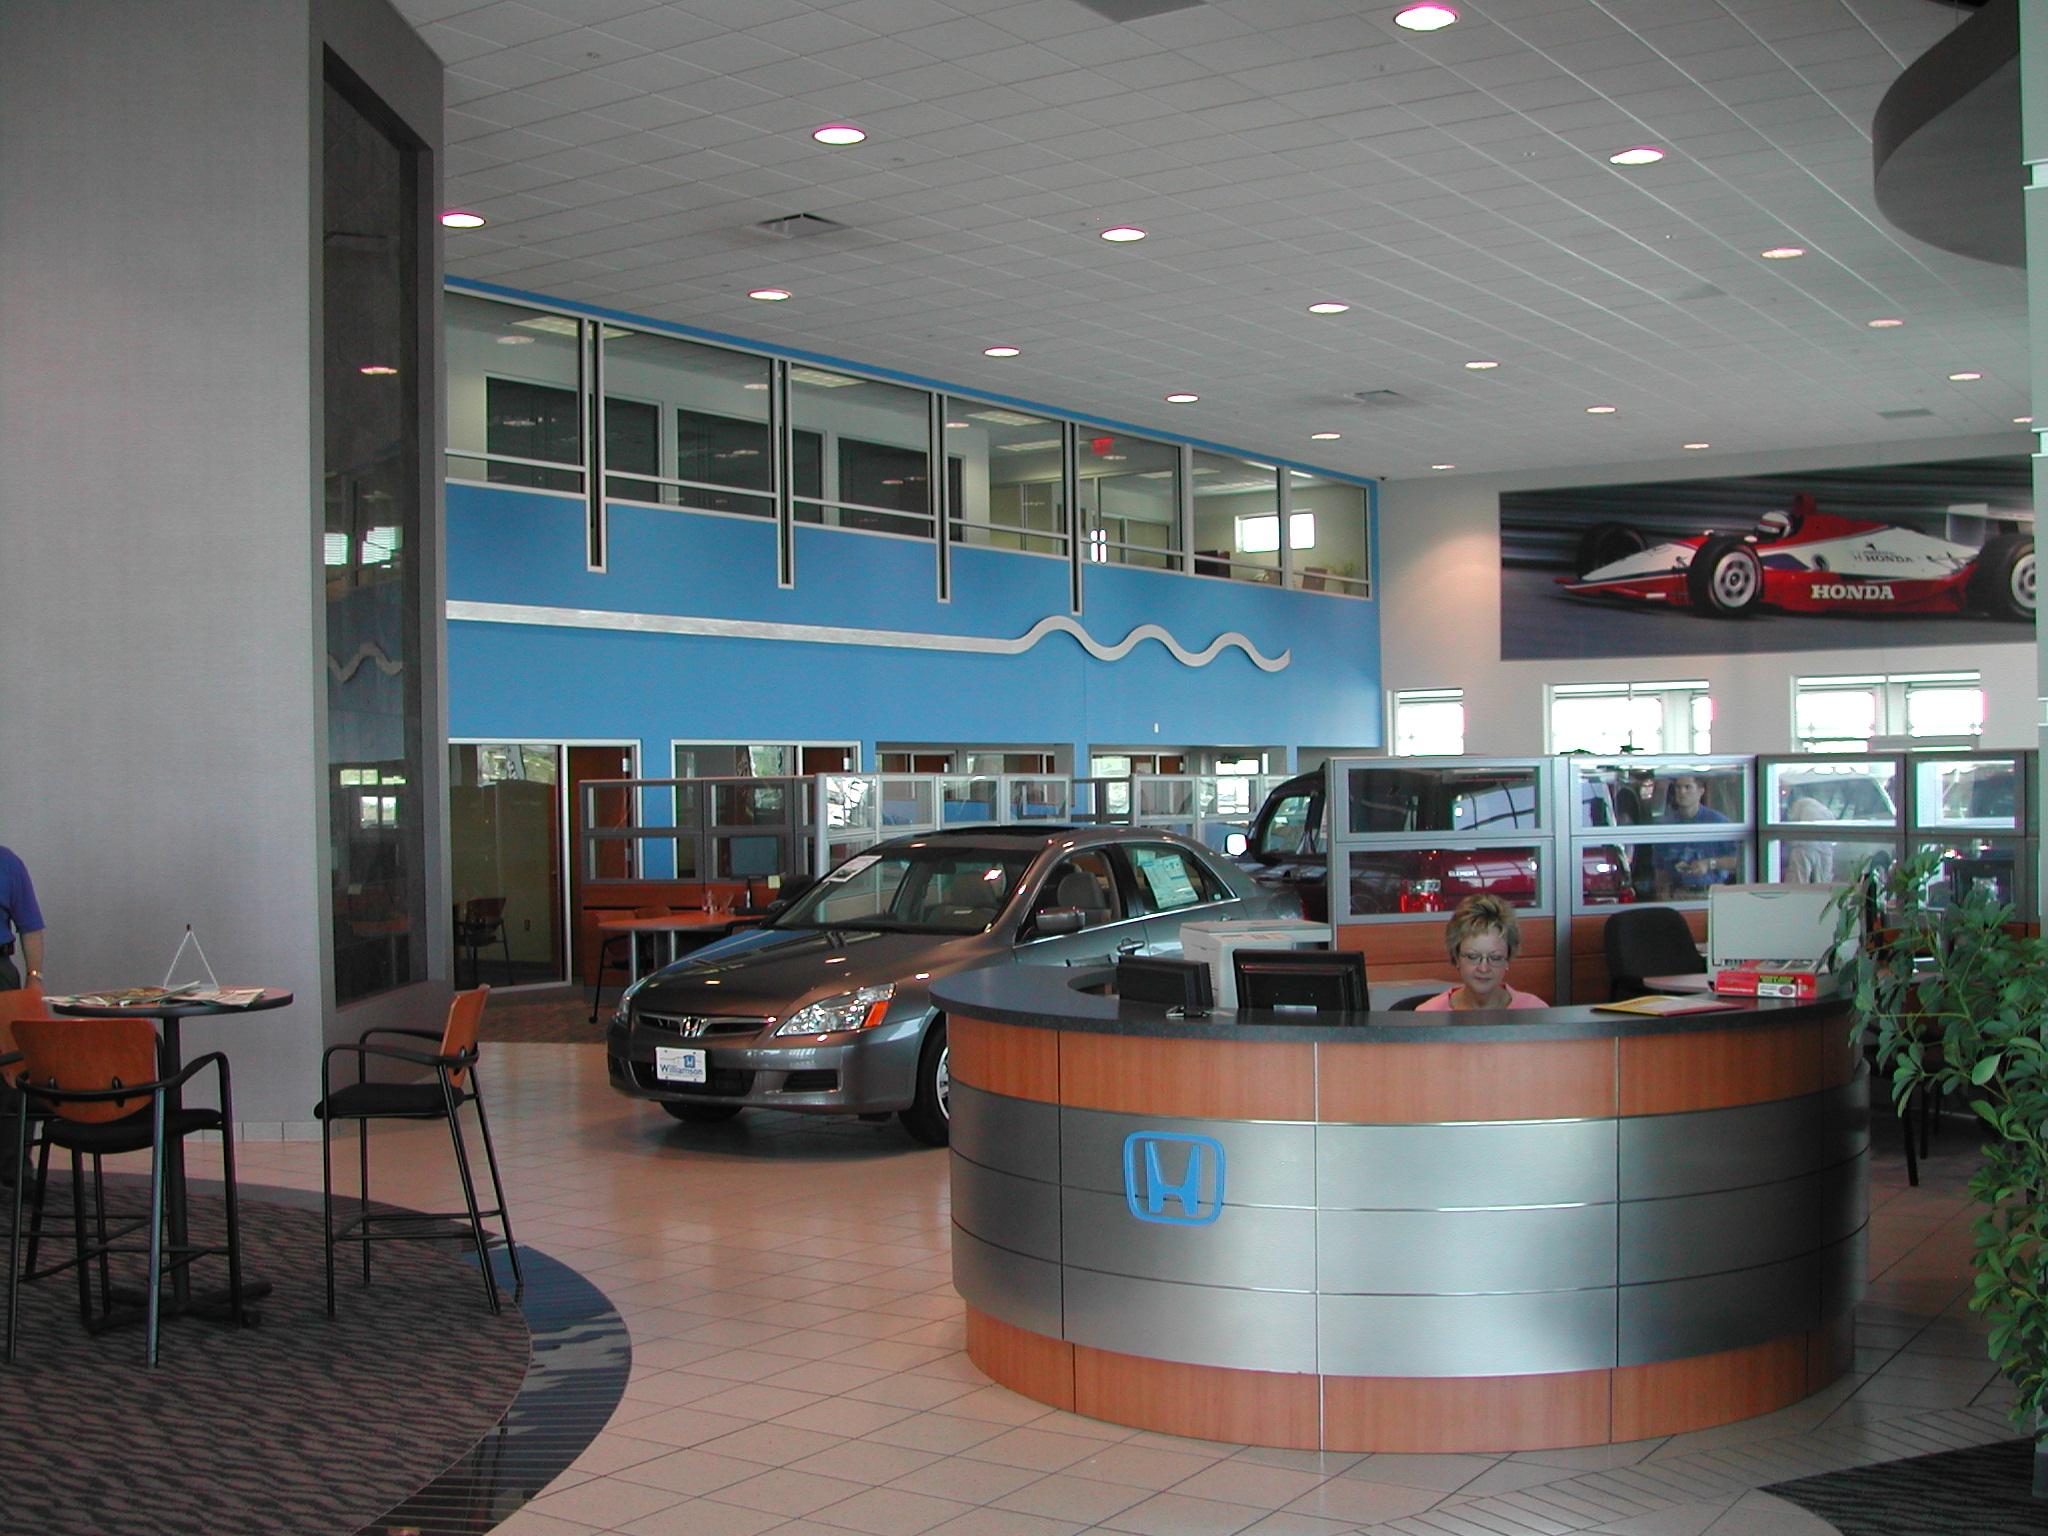 Honda Of Lincoln Lincoln Ne 68516 Angies List